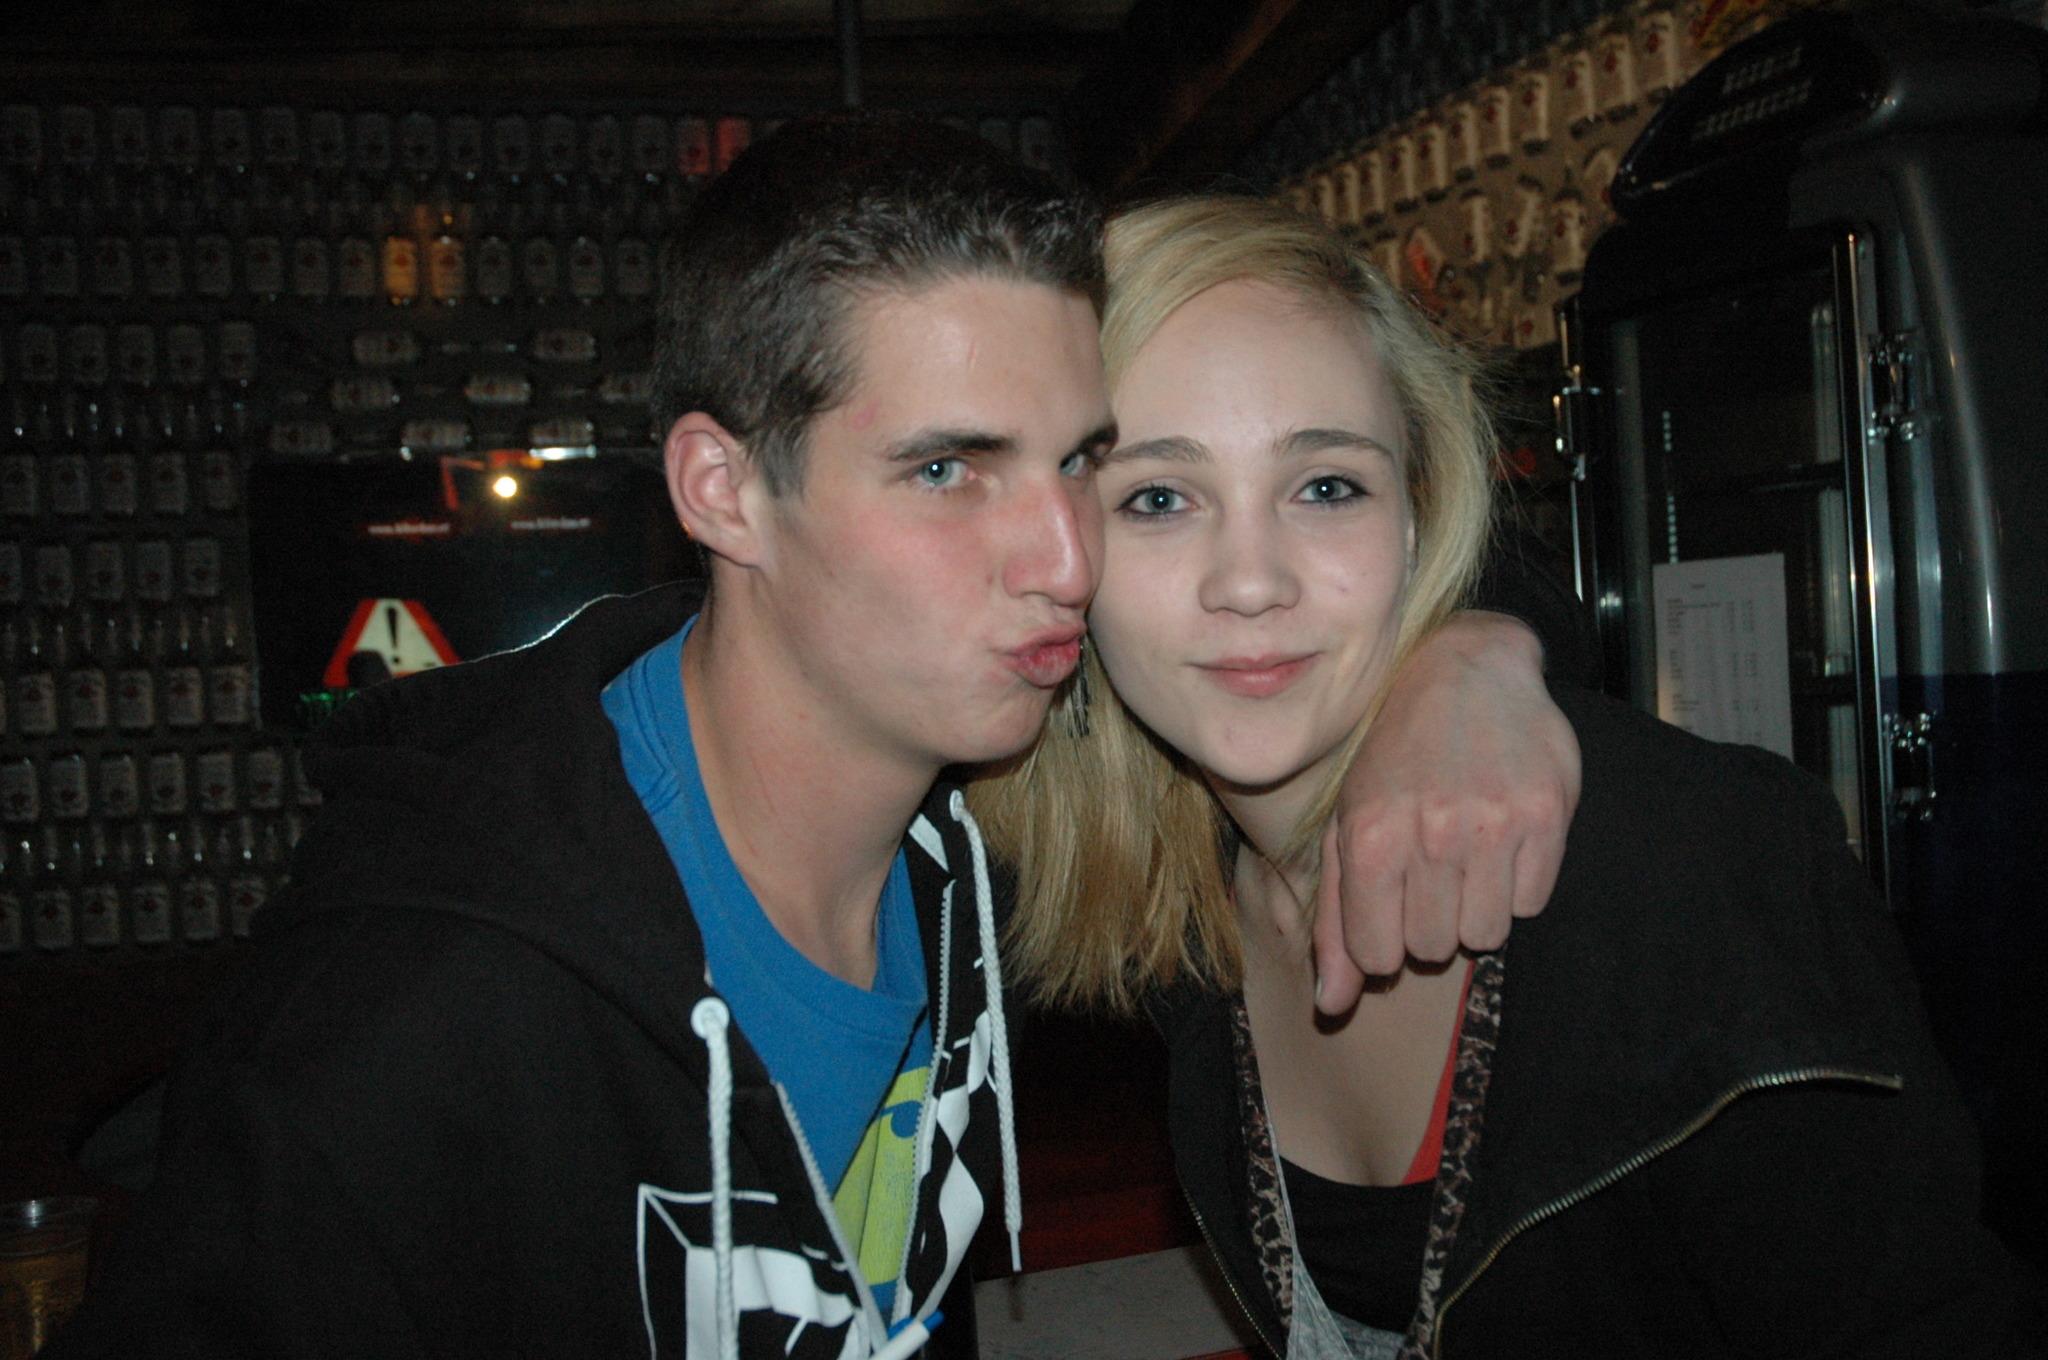 Casual dating in lanitzhhe Privat kontakt frauen sex